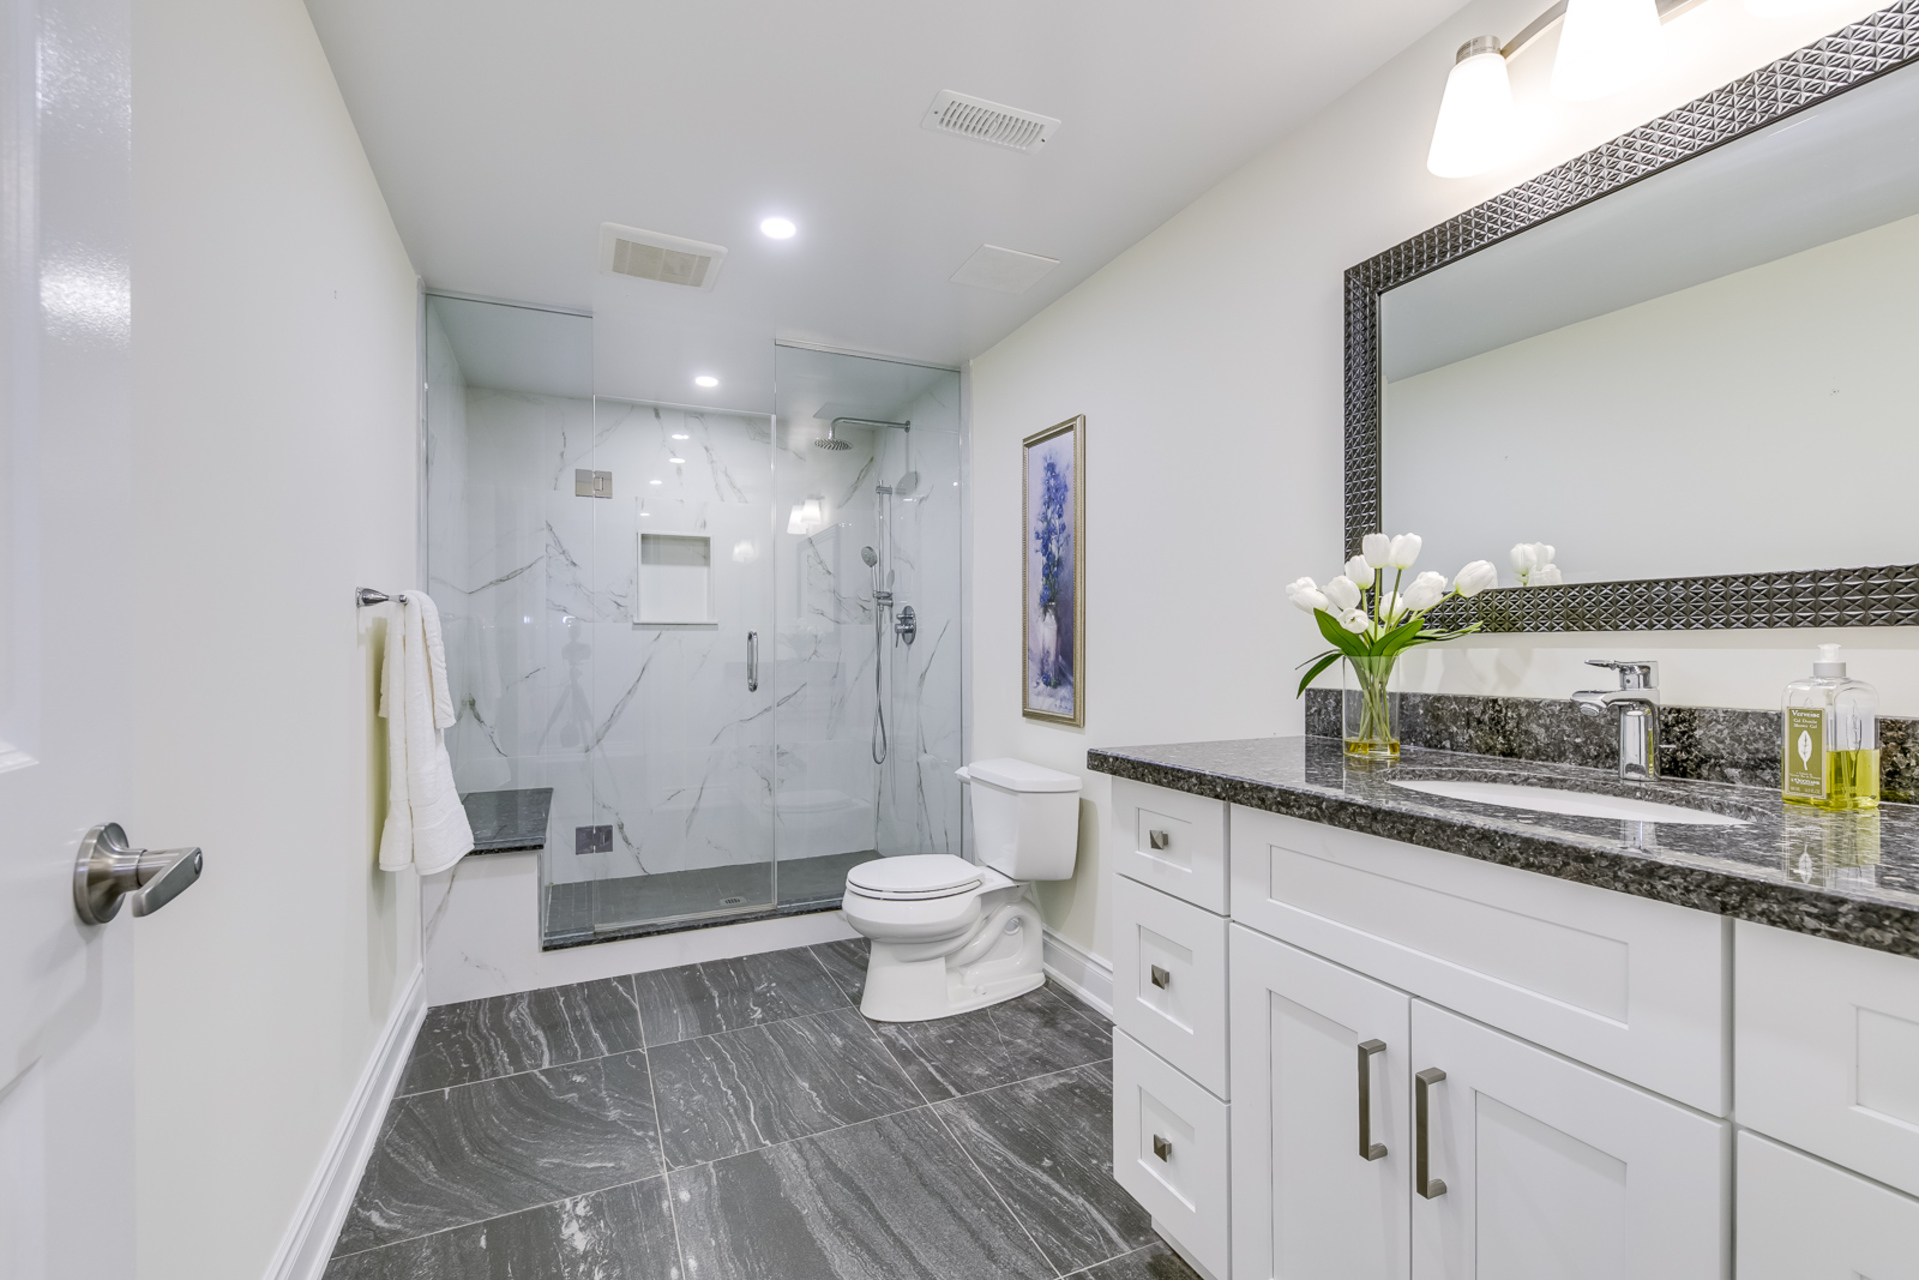 Bathroom - 1276 Kestell Blvd, Oakville - Elite3 & Team at 1276 Kestell Boulevard, Iroquois Ridge North, Oakville